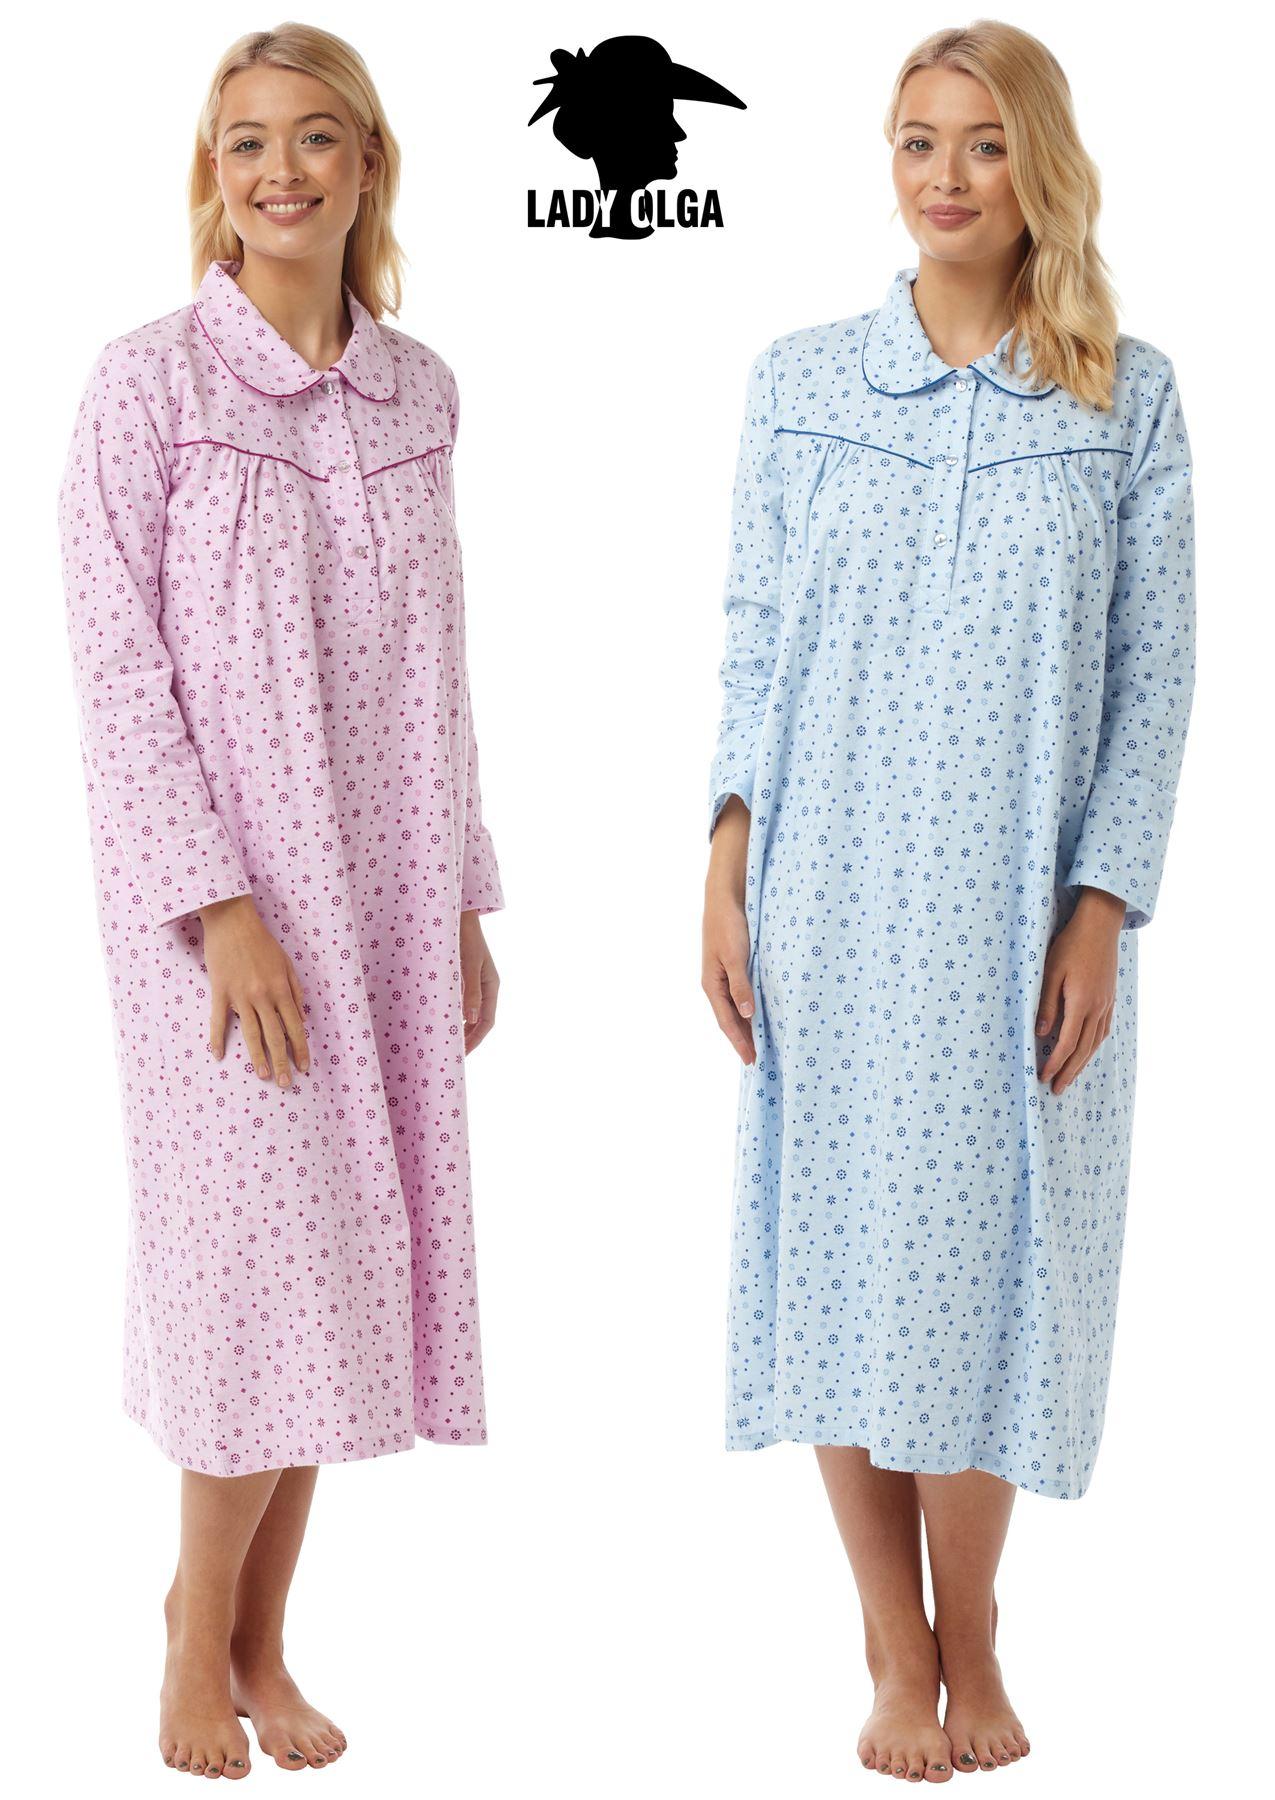 7f66b8a125 Details about Womens Luxury Lady Olga Brushed Cotton Wincyette Long Sleeve Nightie  Nightdress